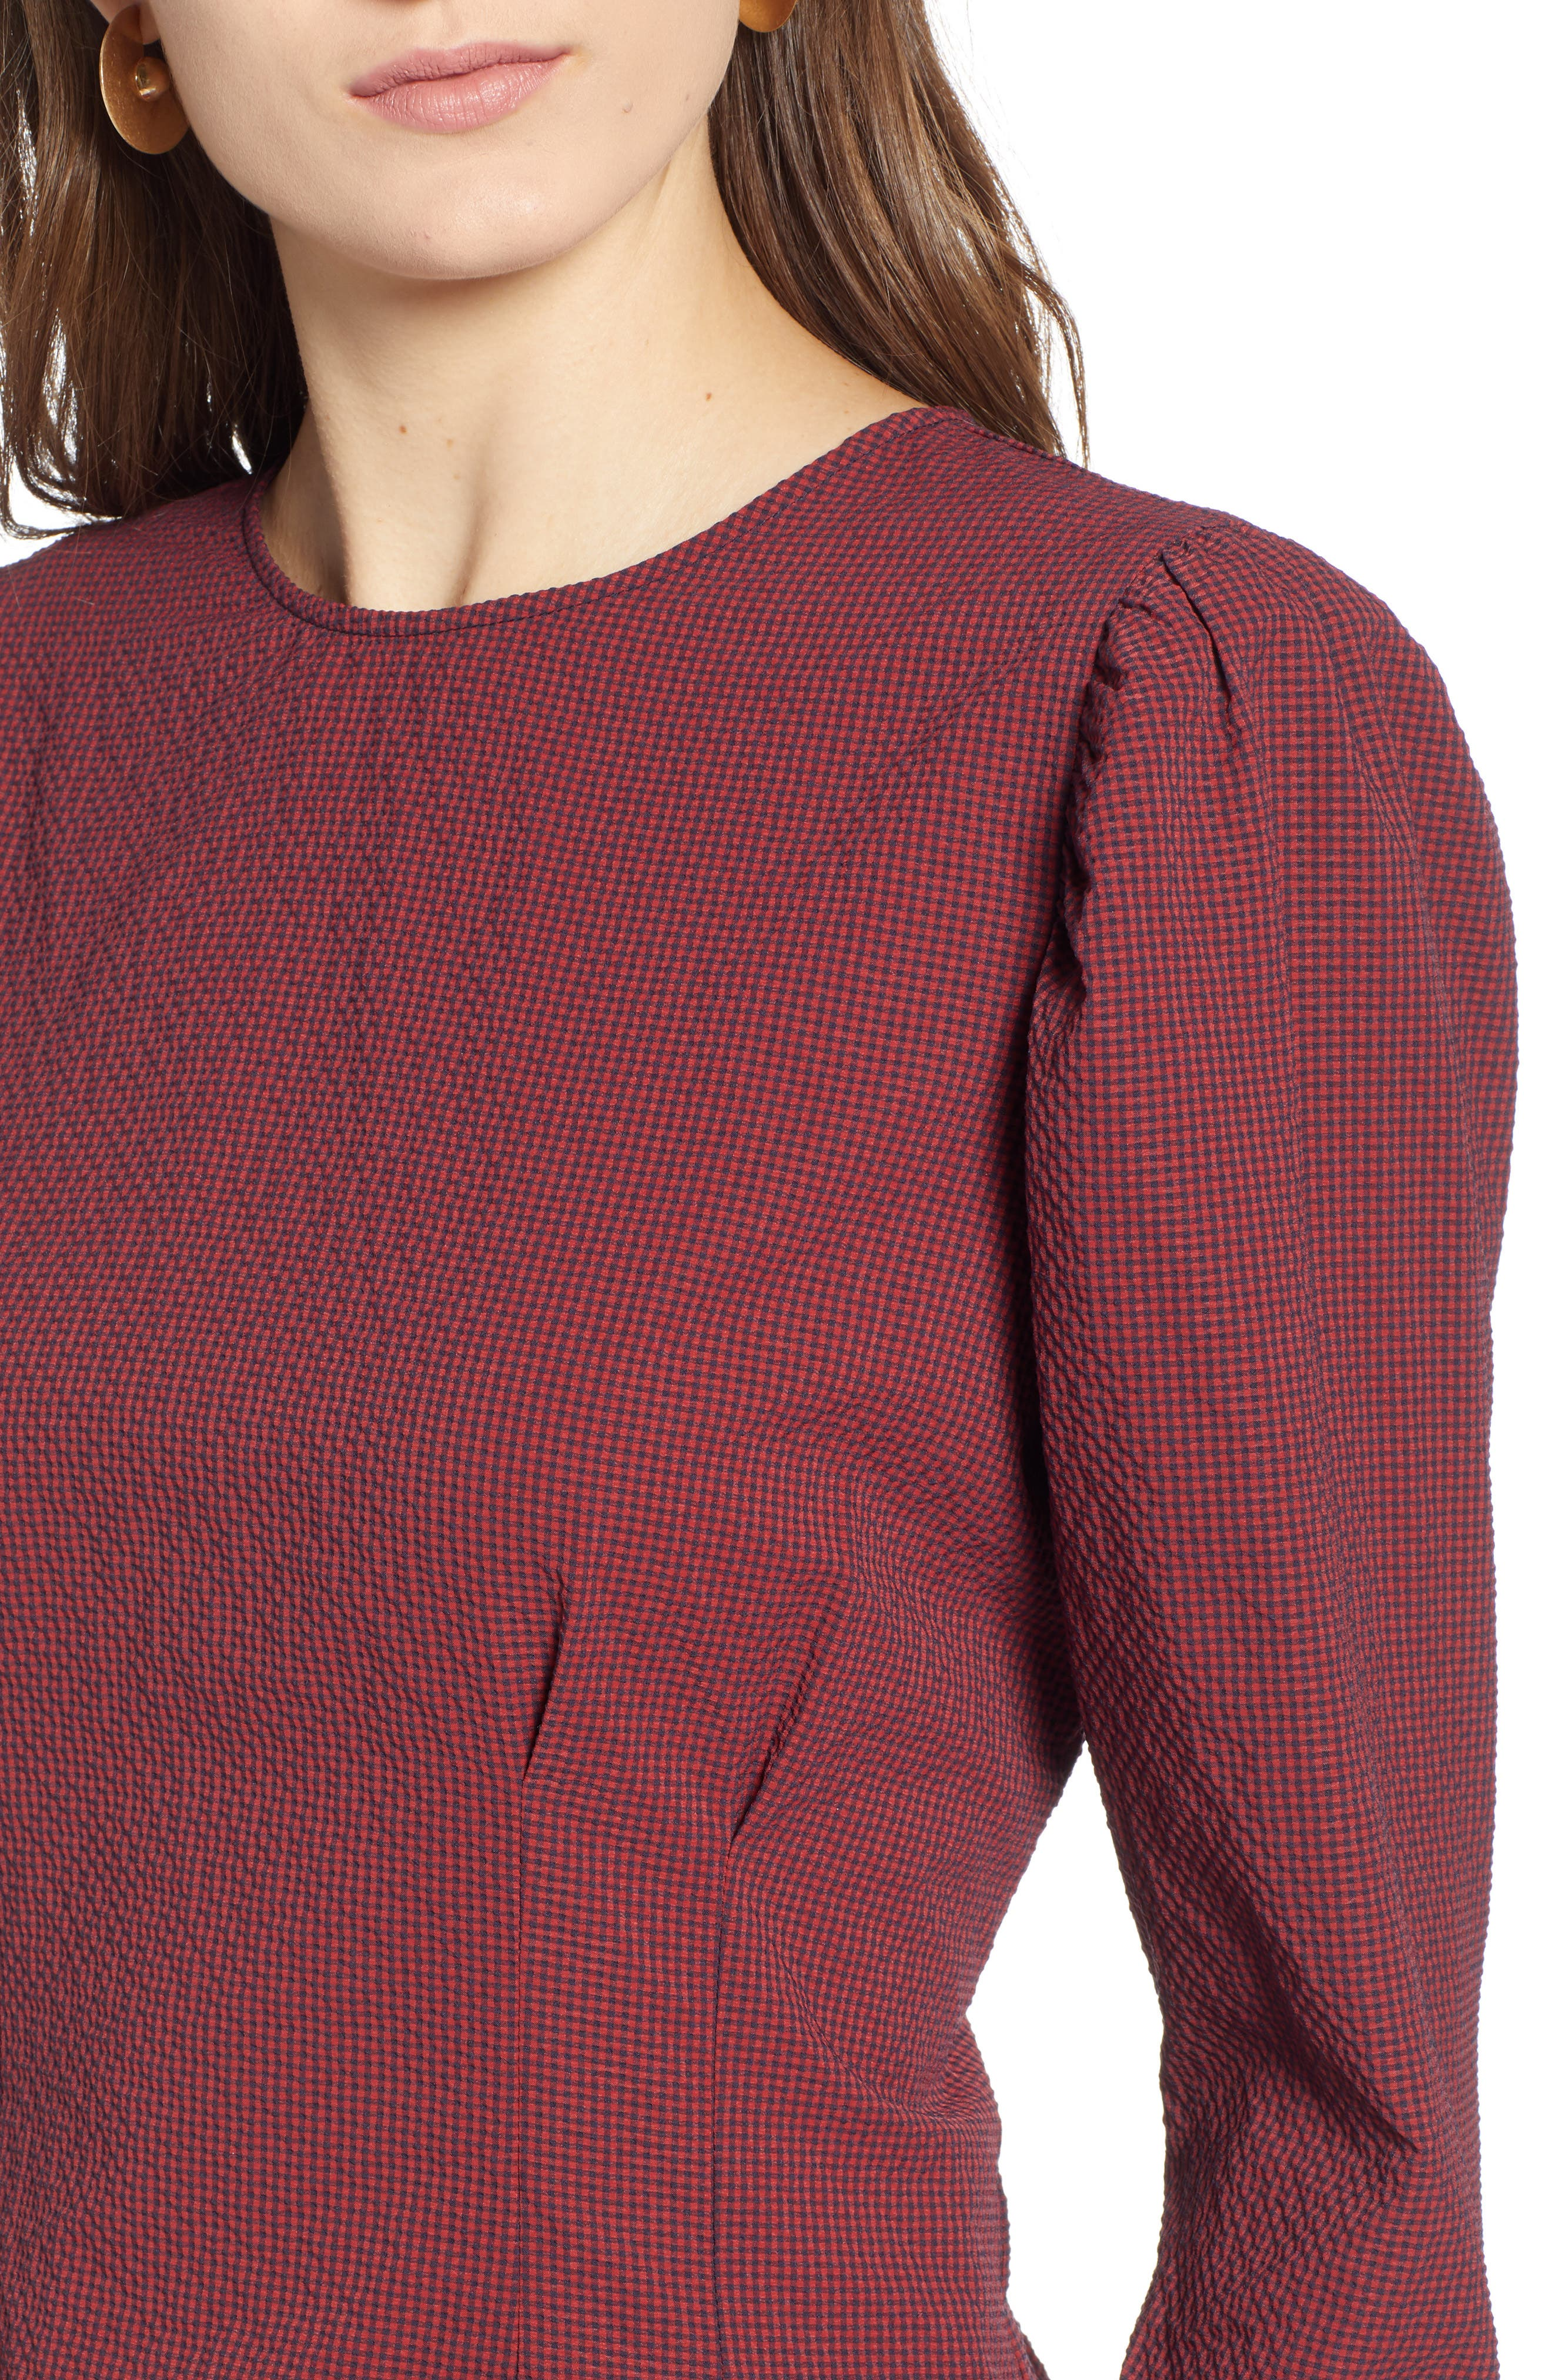 TREASURE & BOND,                             Mini Gingham Puff Sleeve Top,                             Alternate thumbnail 4, color,                             610